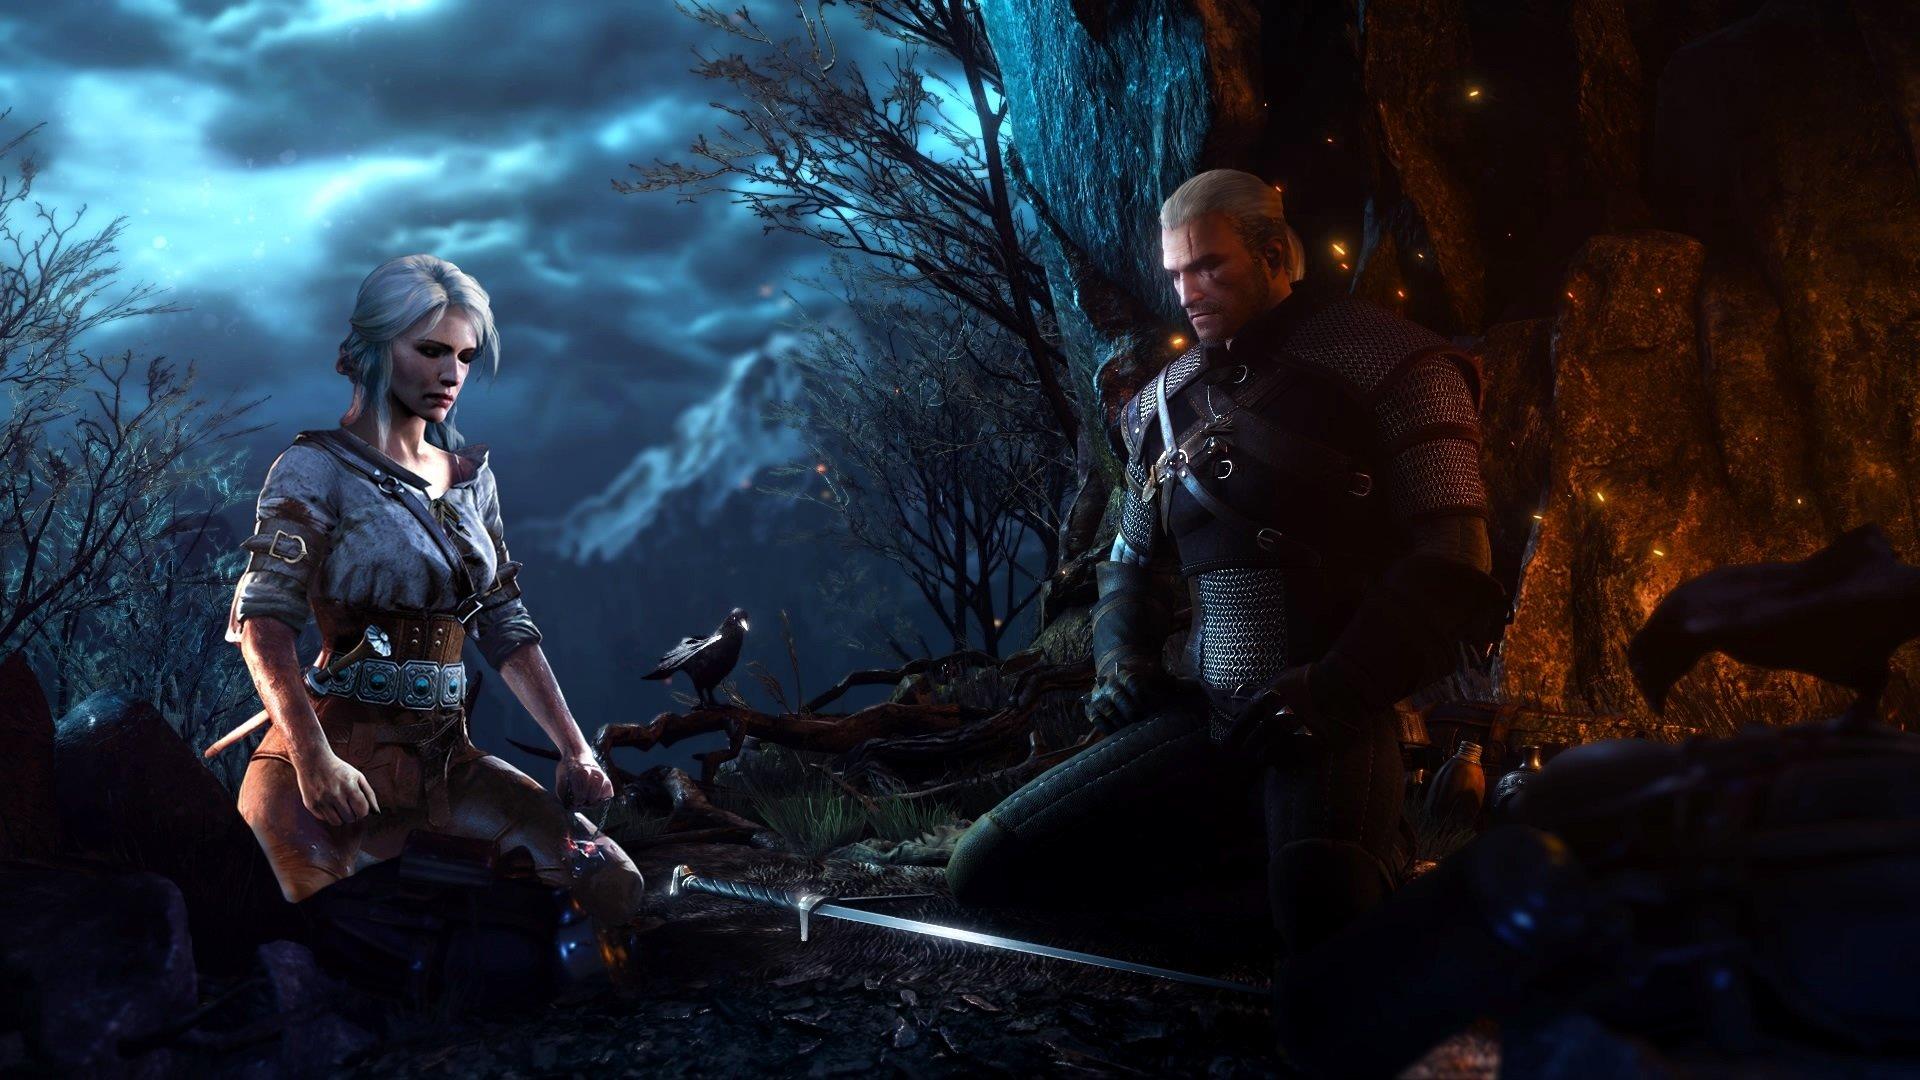 Geralt of rivia and Ciri HD Wallpaper Background Image 1920x1080